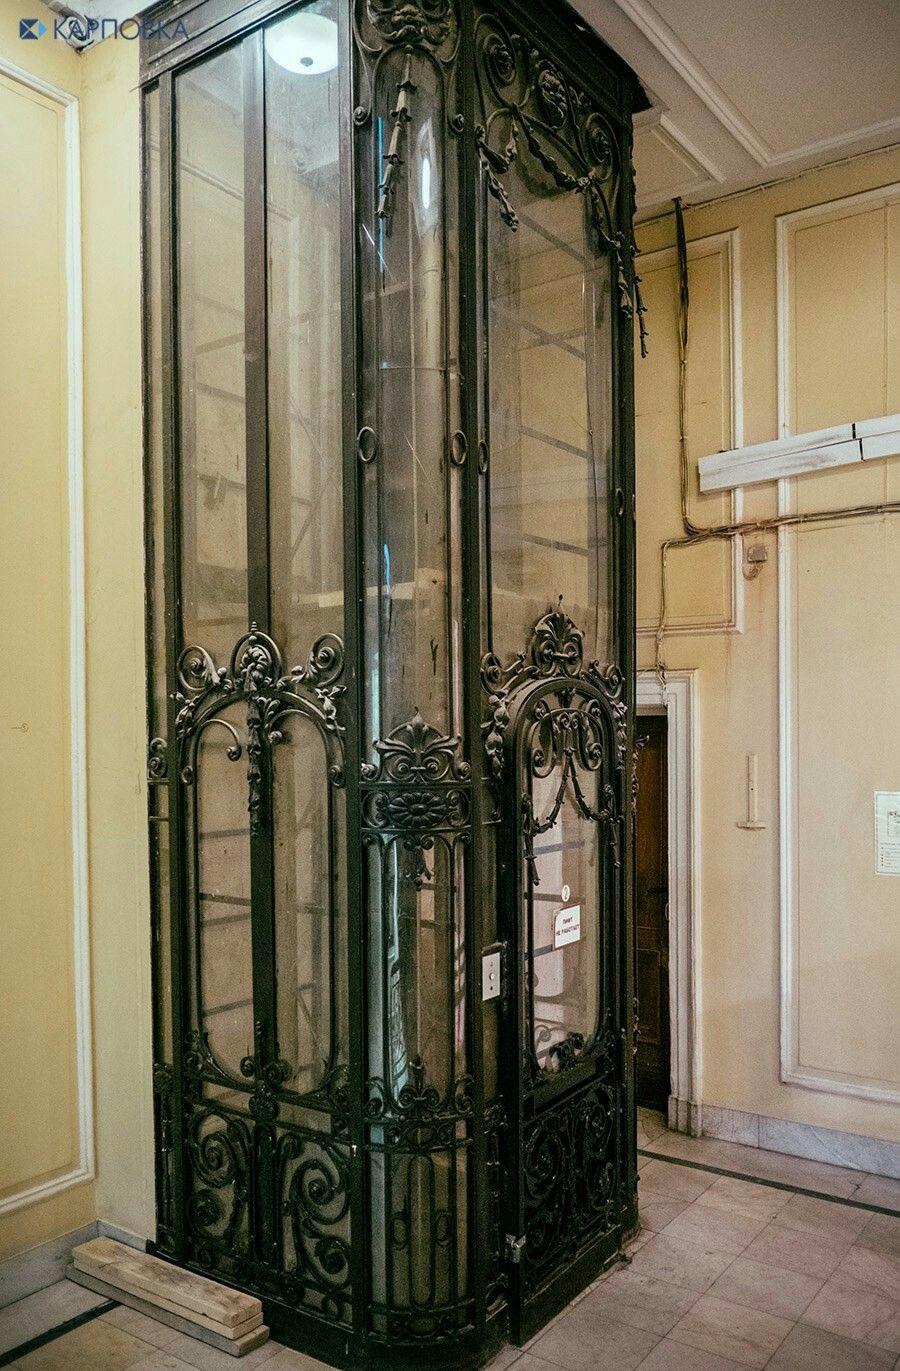 St petersburg vintage elevator refridgerators ice boxes